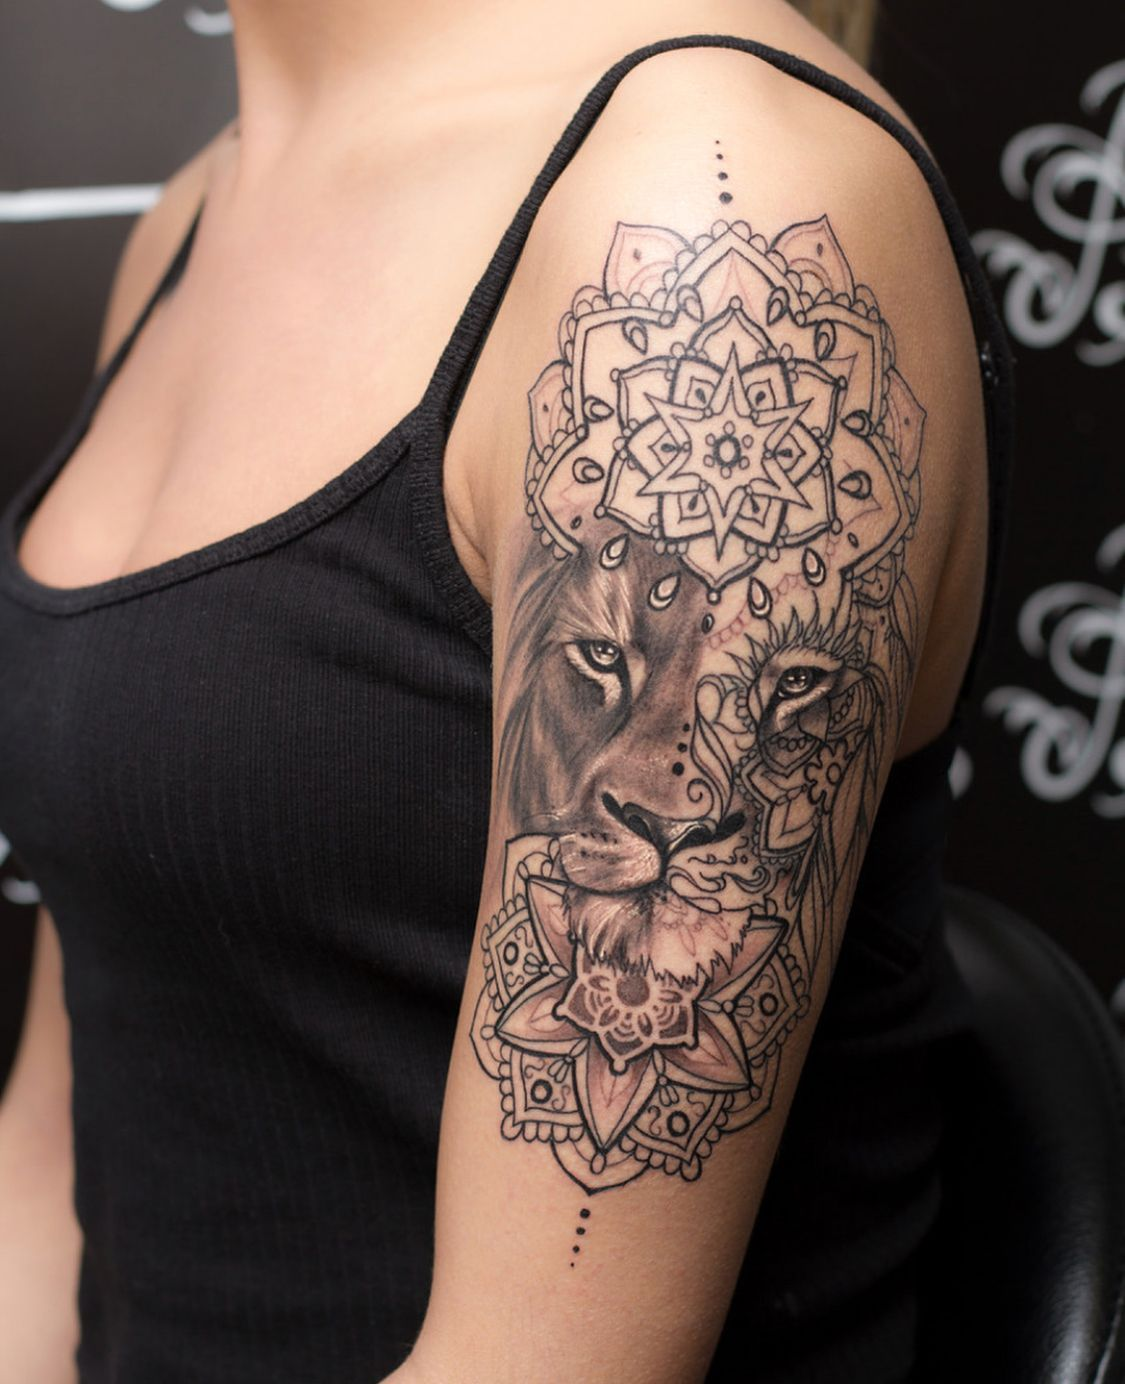 Pin By Fanni Mensola On Tatuagem Feminina Braco In 2020 Sleeve Tattoos For Women Mandala Tattoos For Women Tattoos